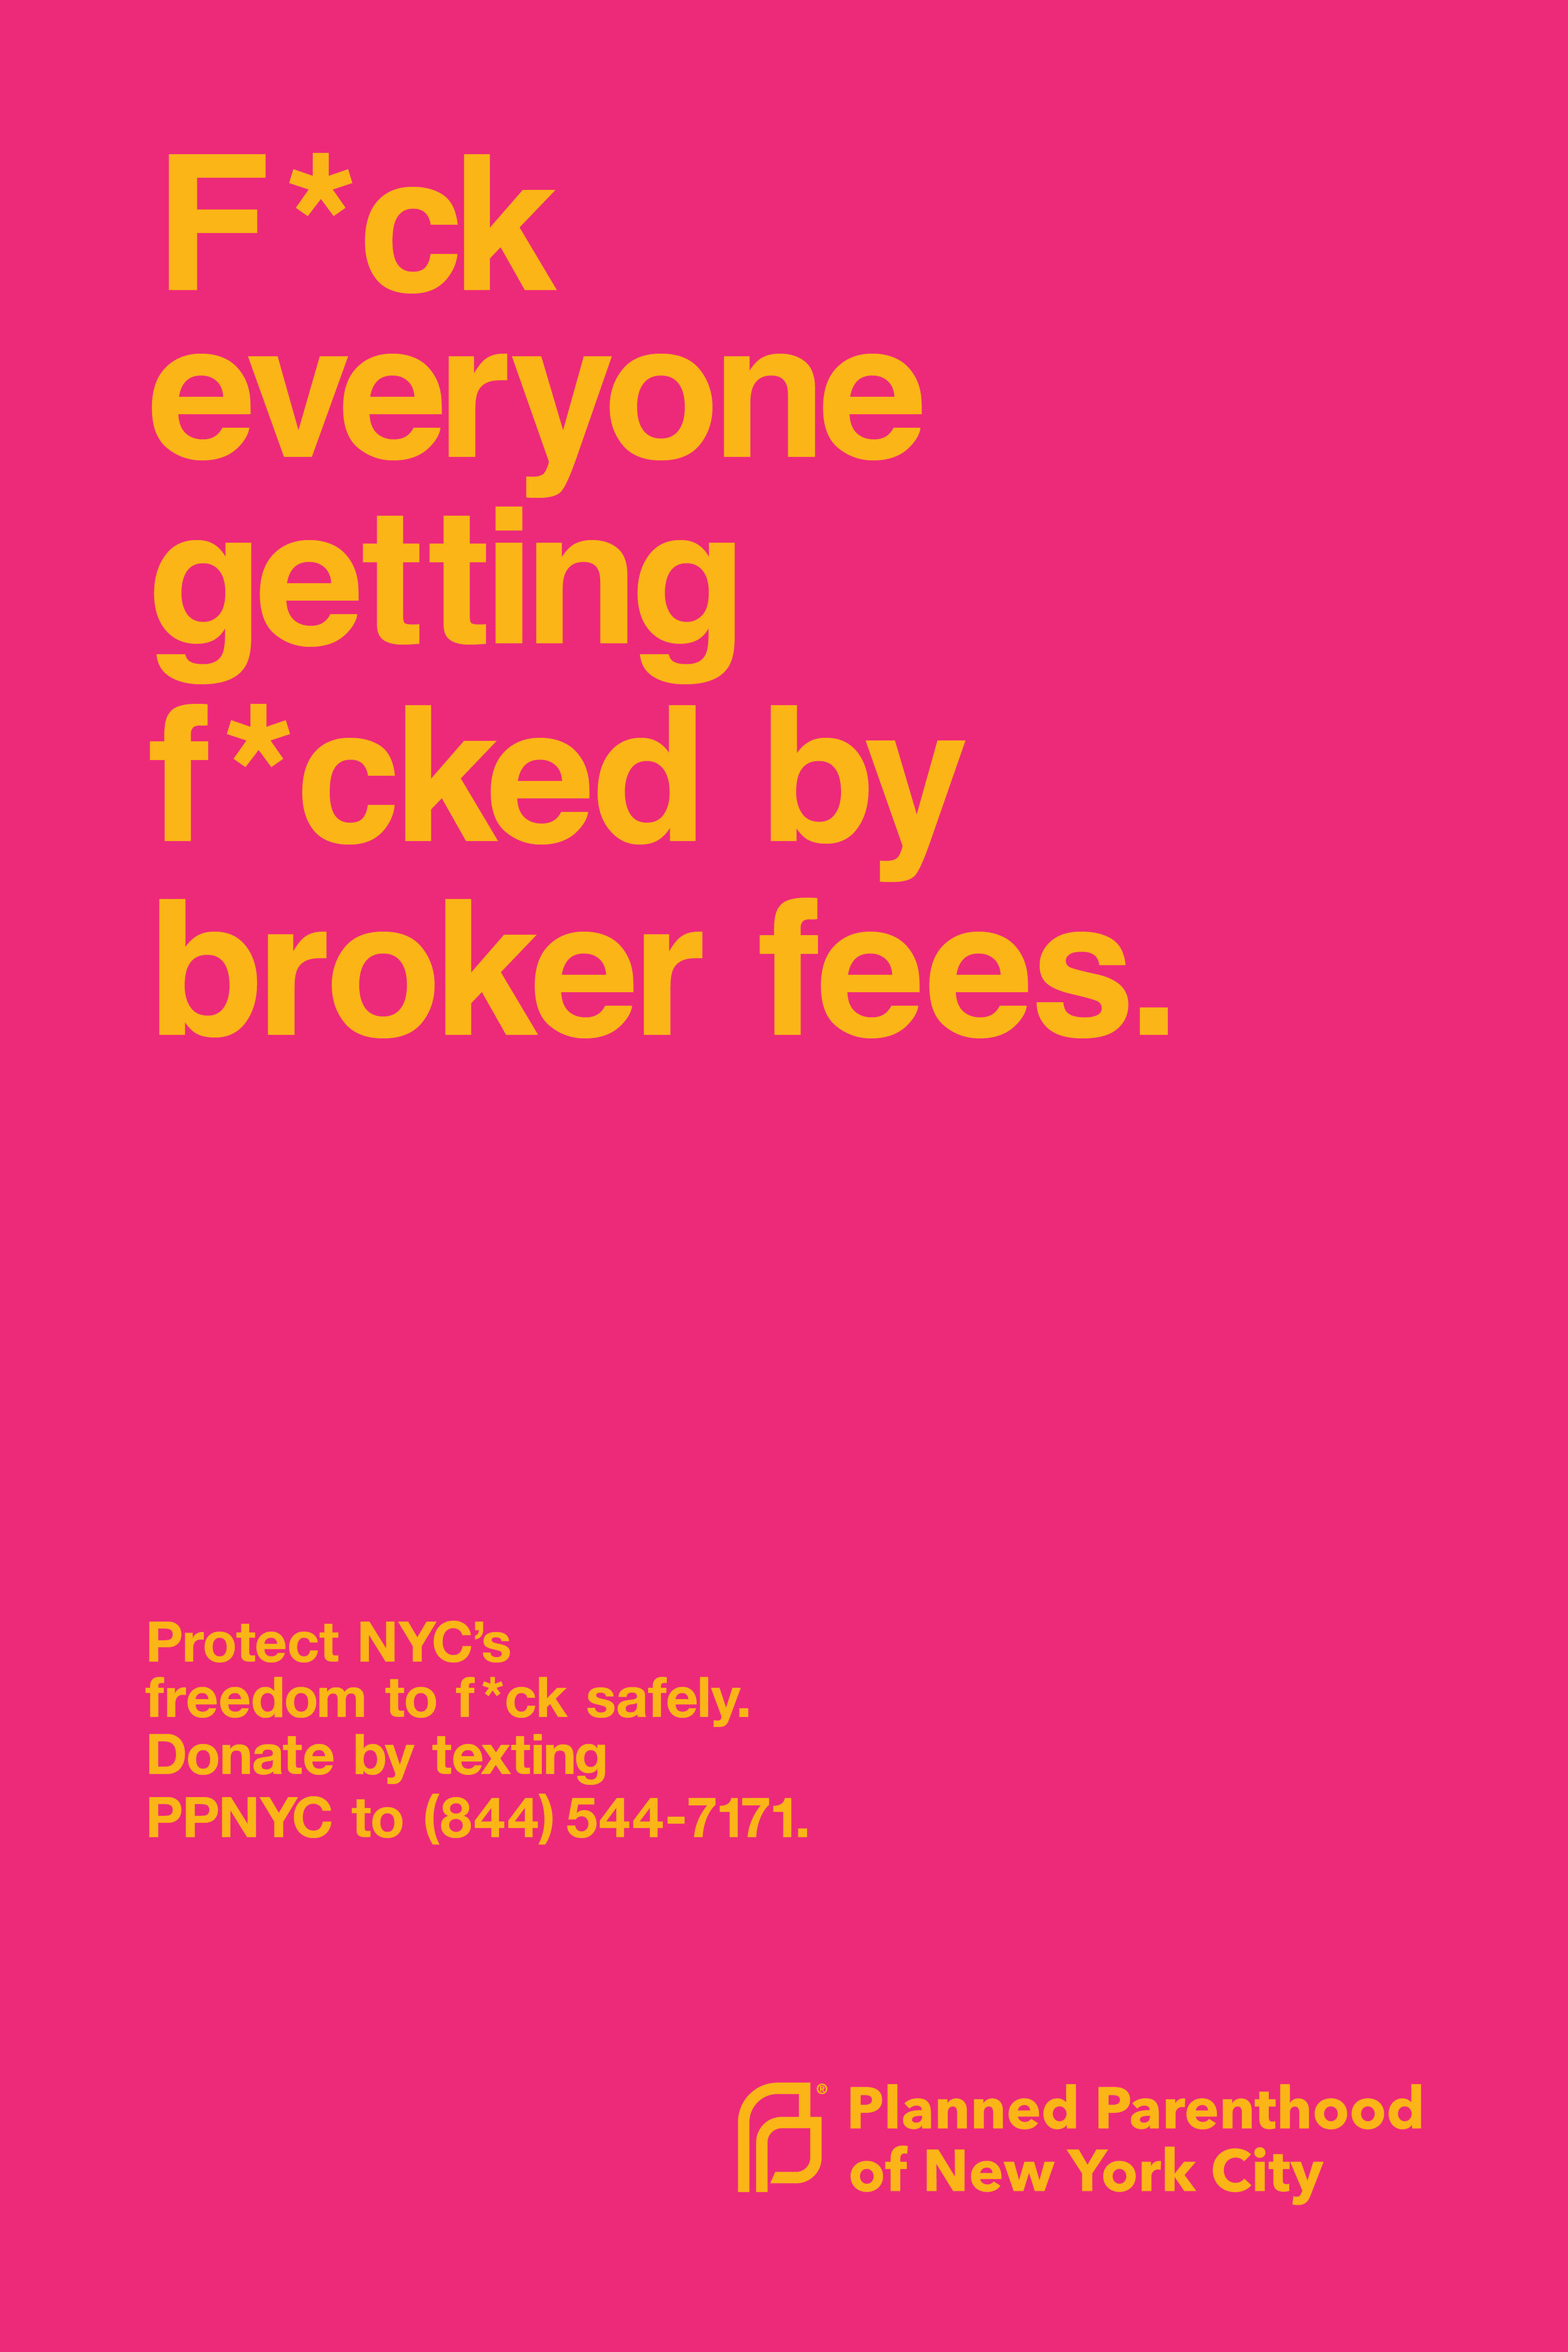 PPNYC_PRINT20.jpg